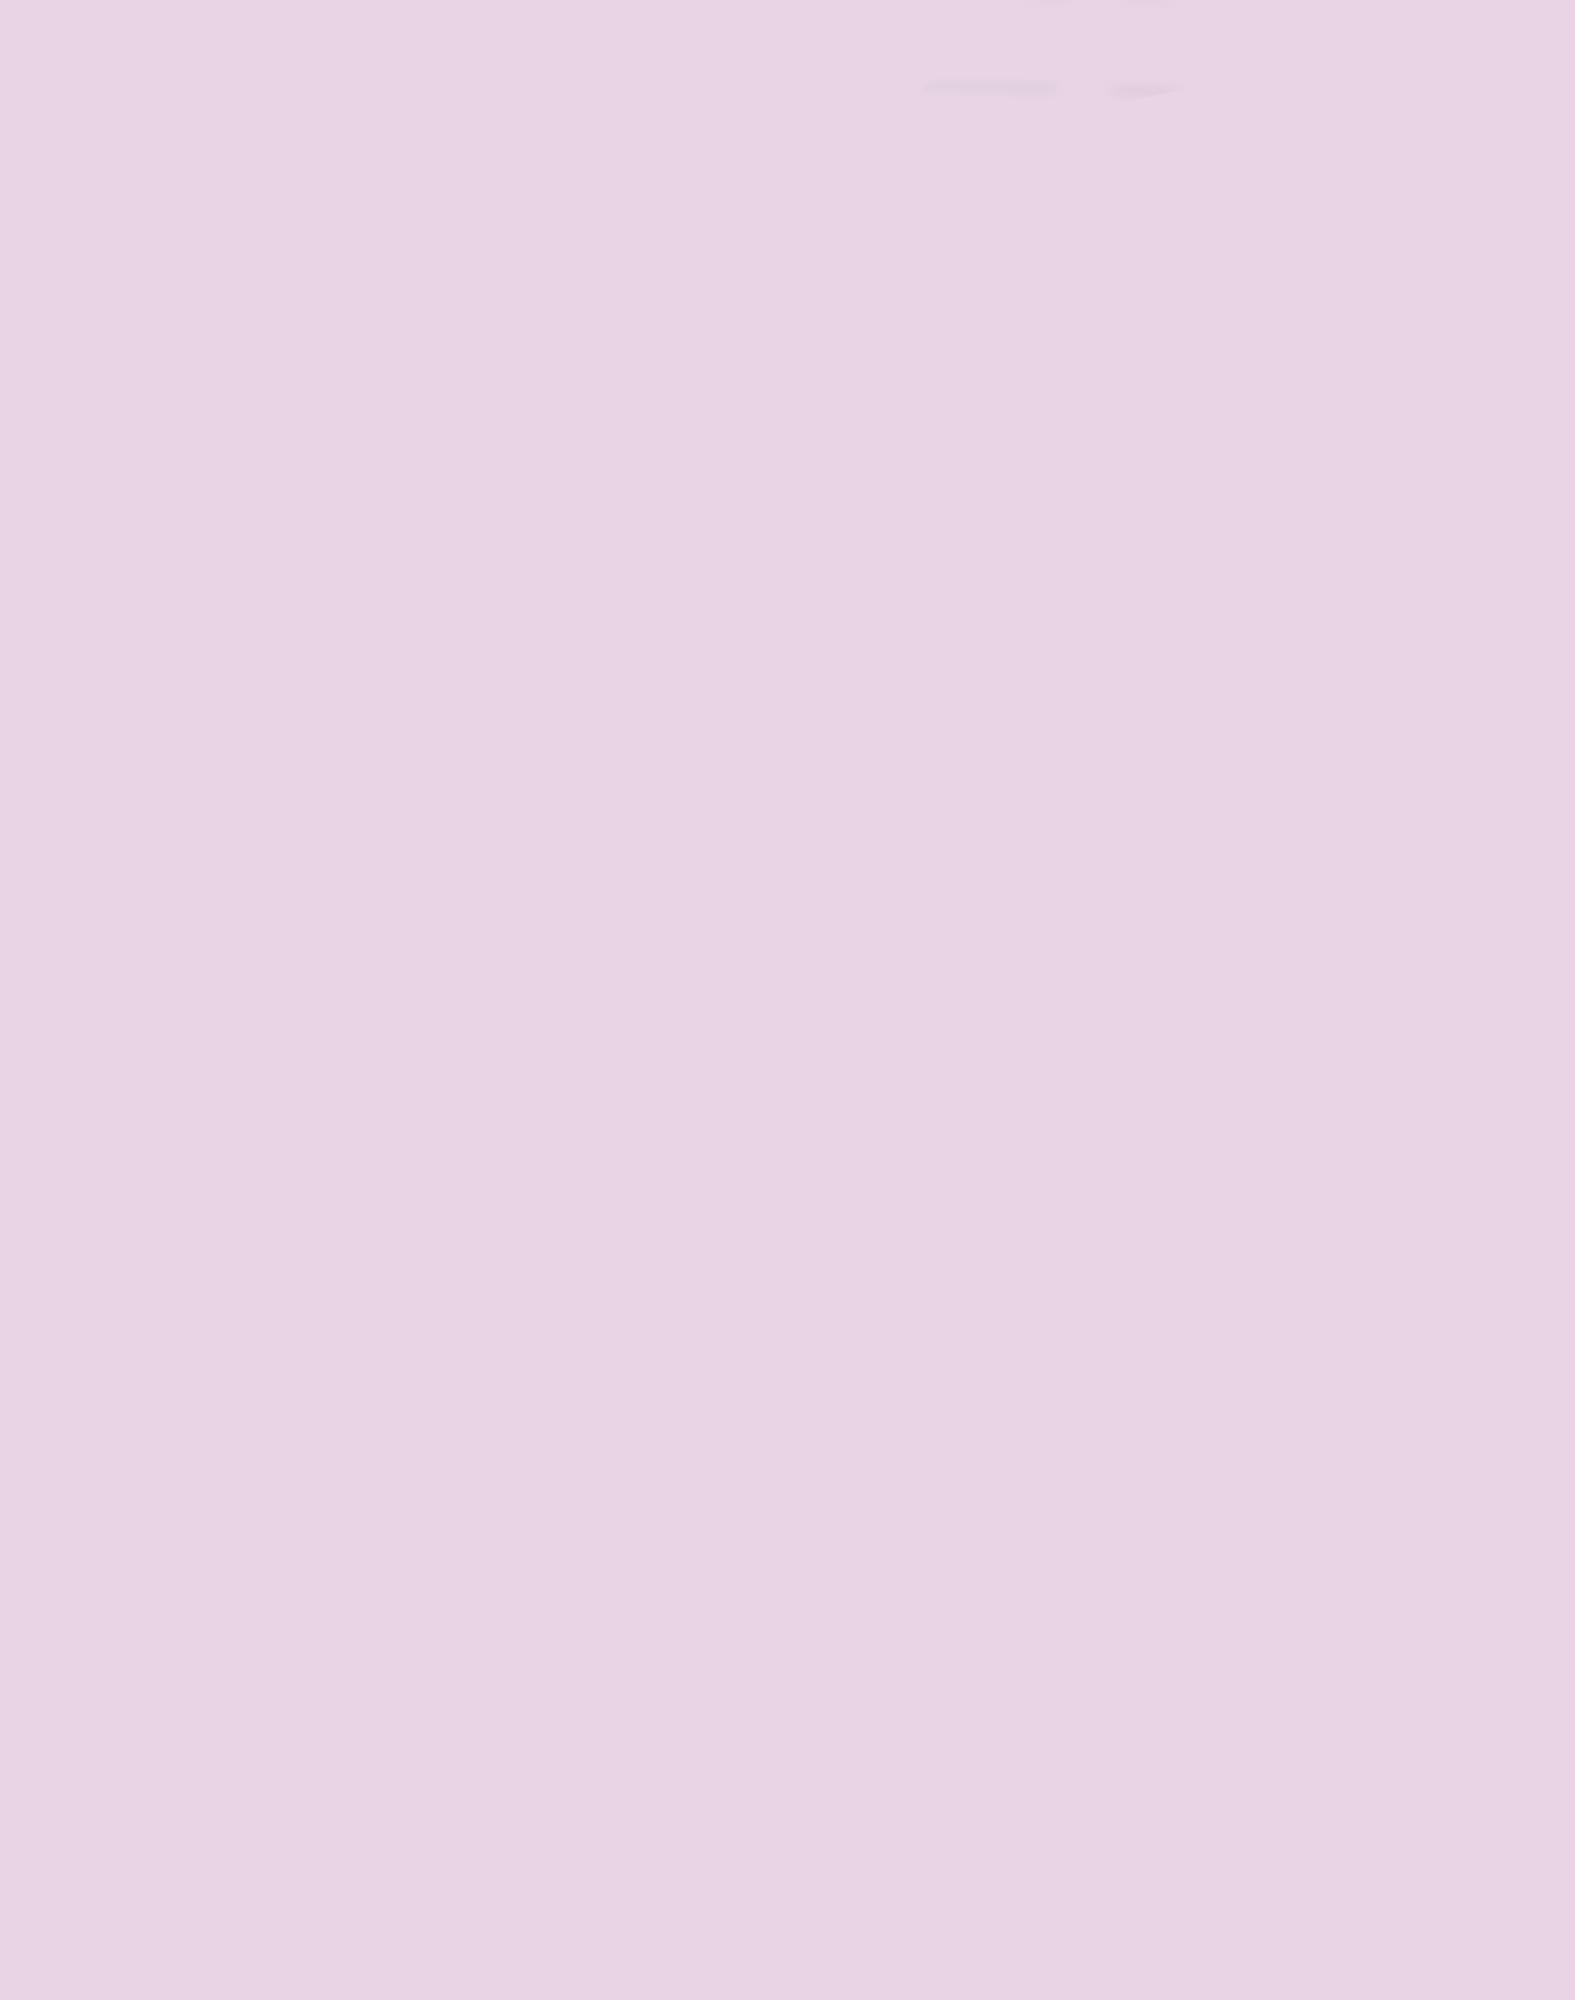 Baby Blossom 232,212,228